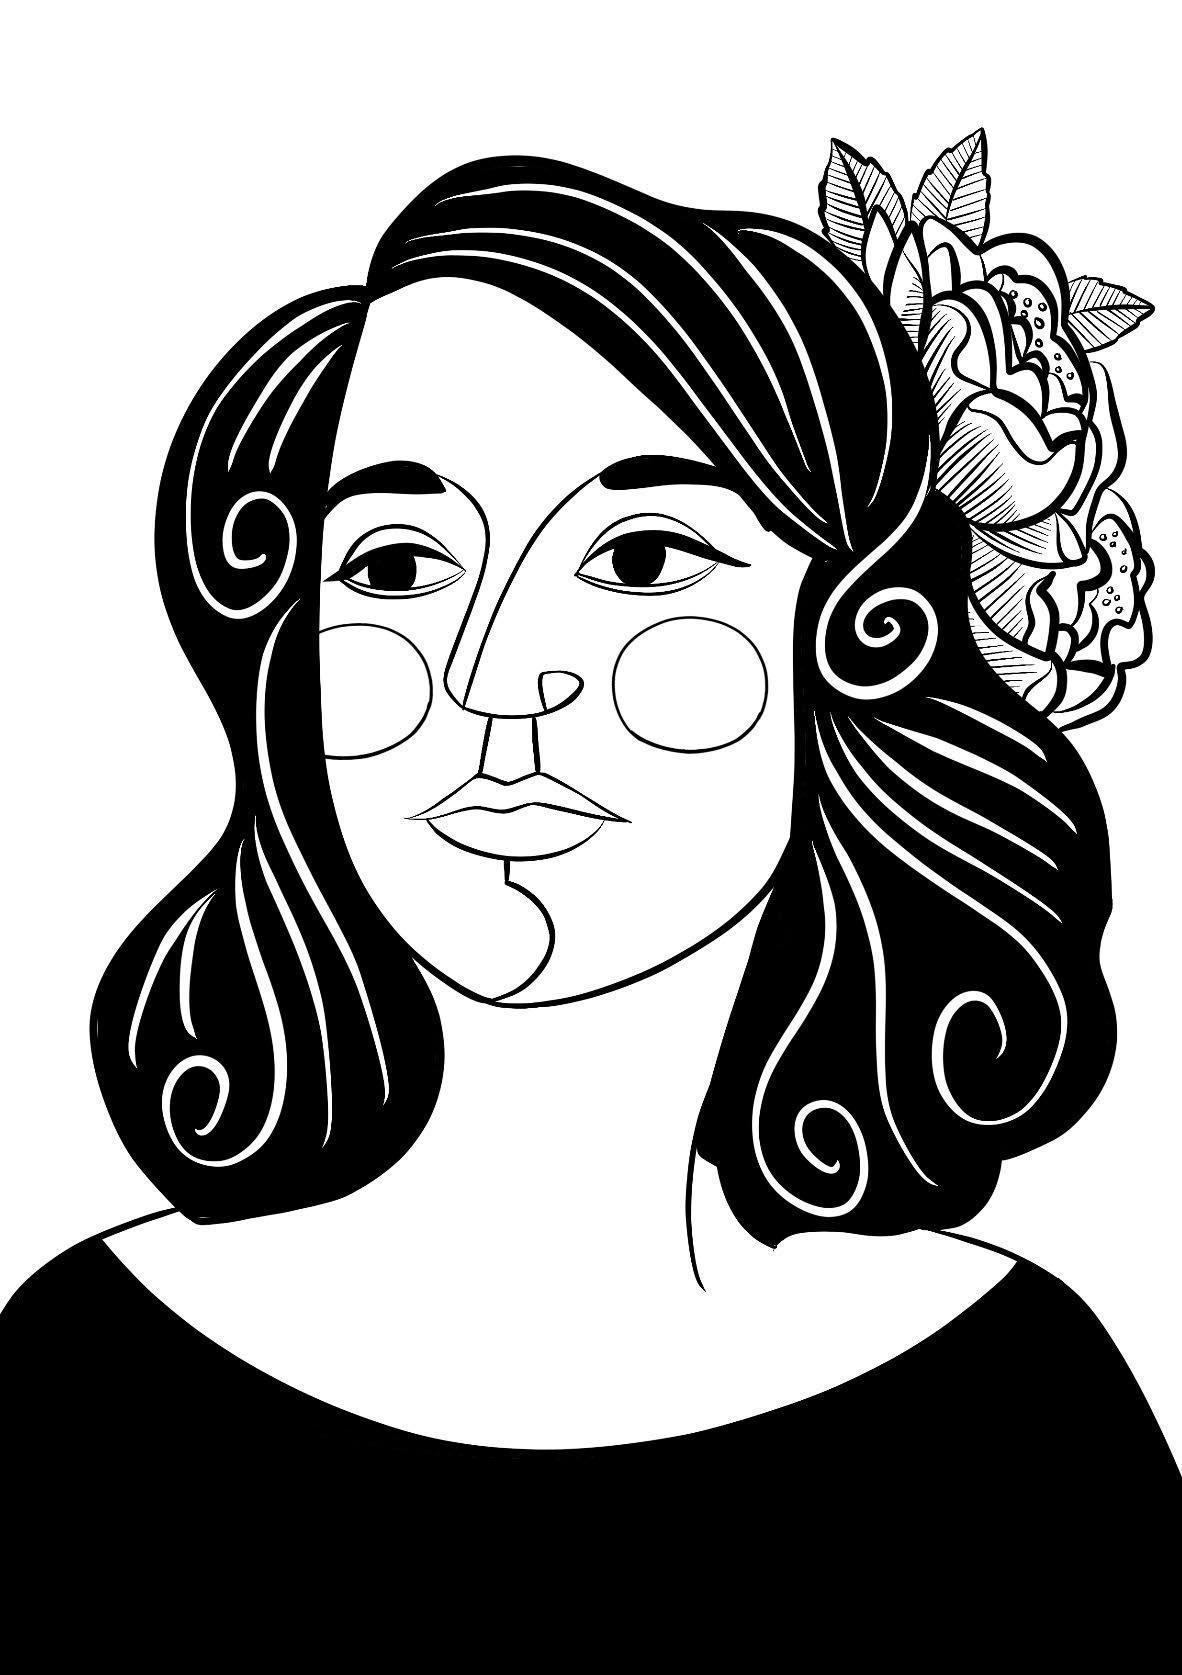 Amy Blackwell's portrait of Marisol Escobar